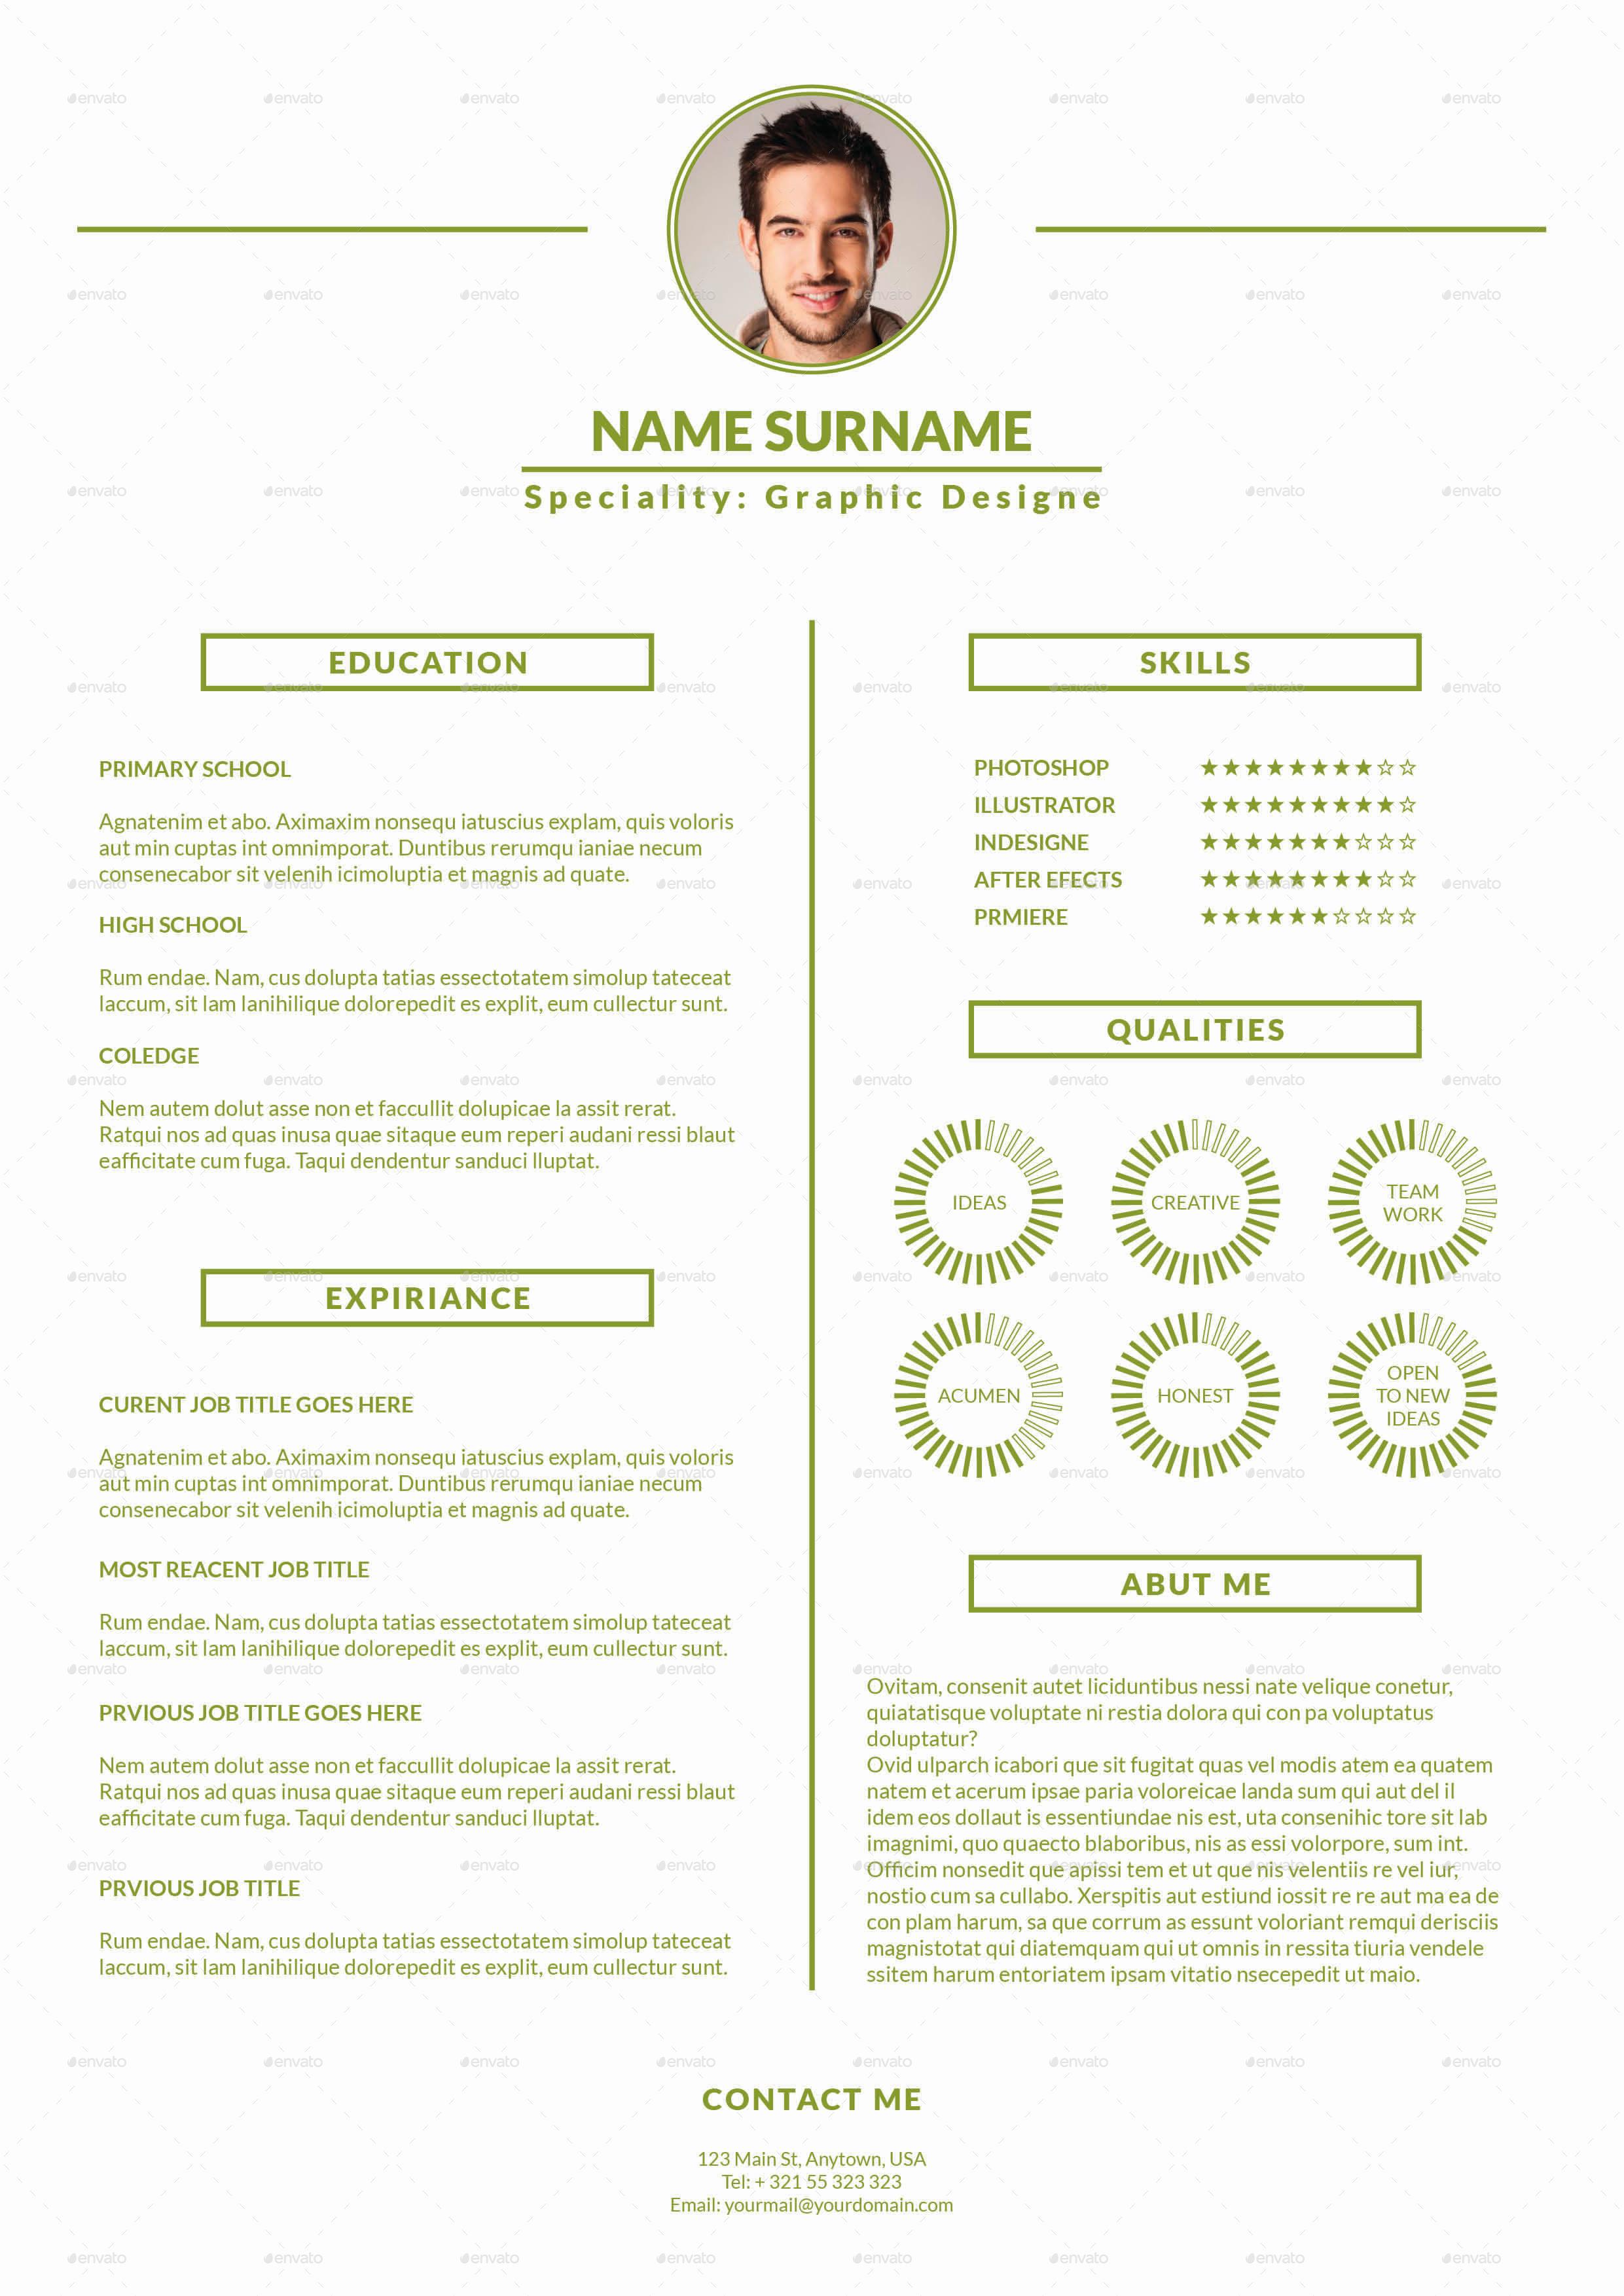 minimalistic cv resume template by milos83 graphicriver